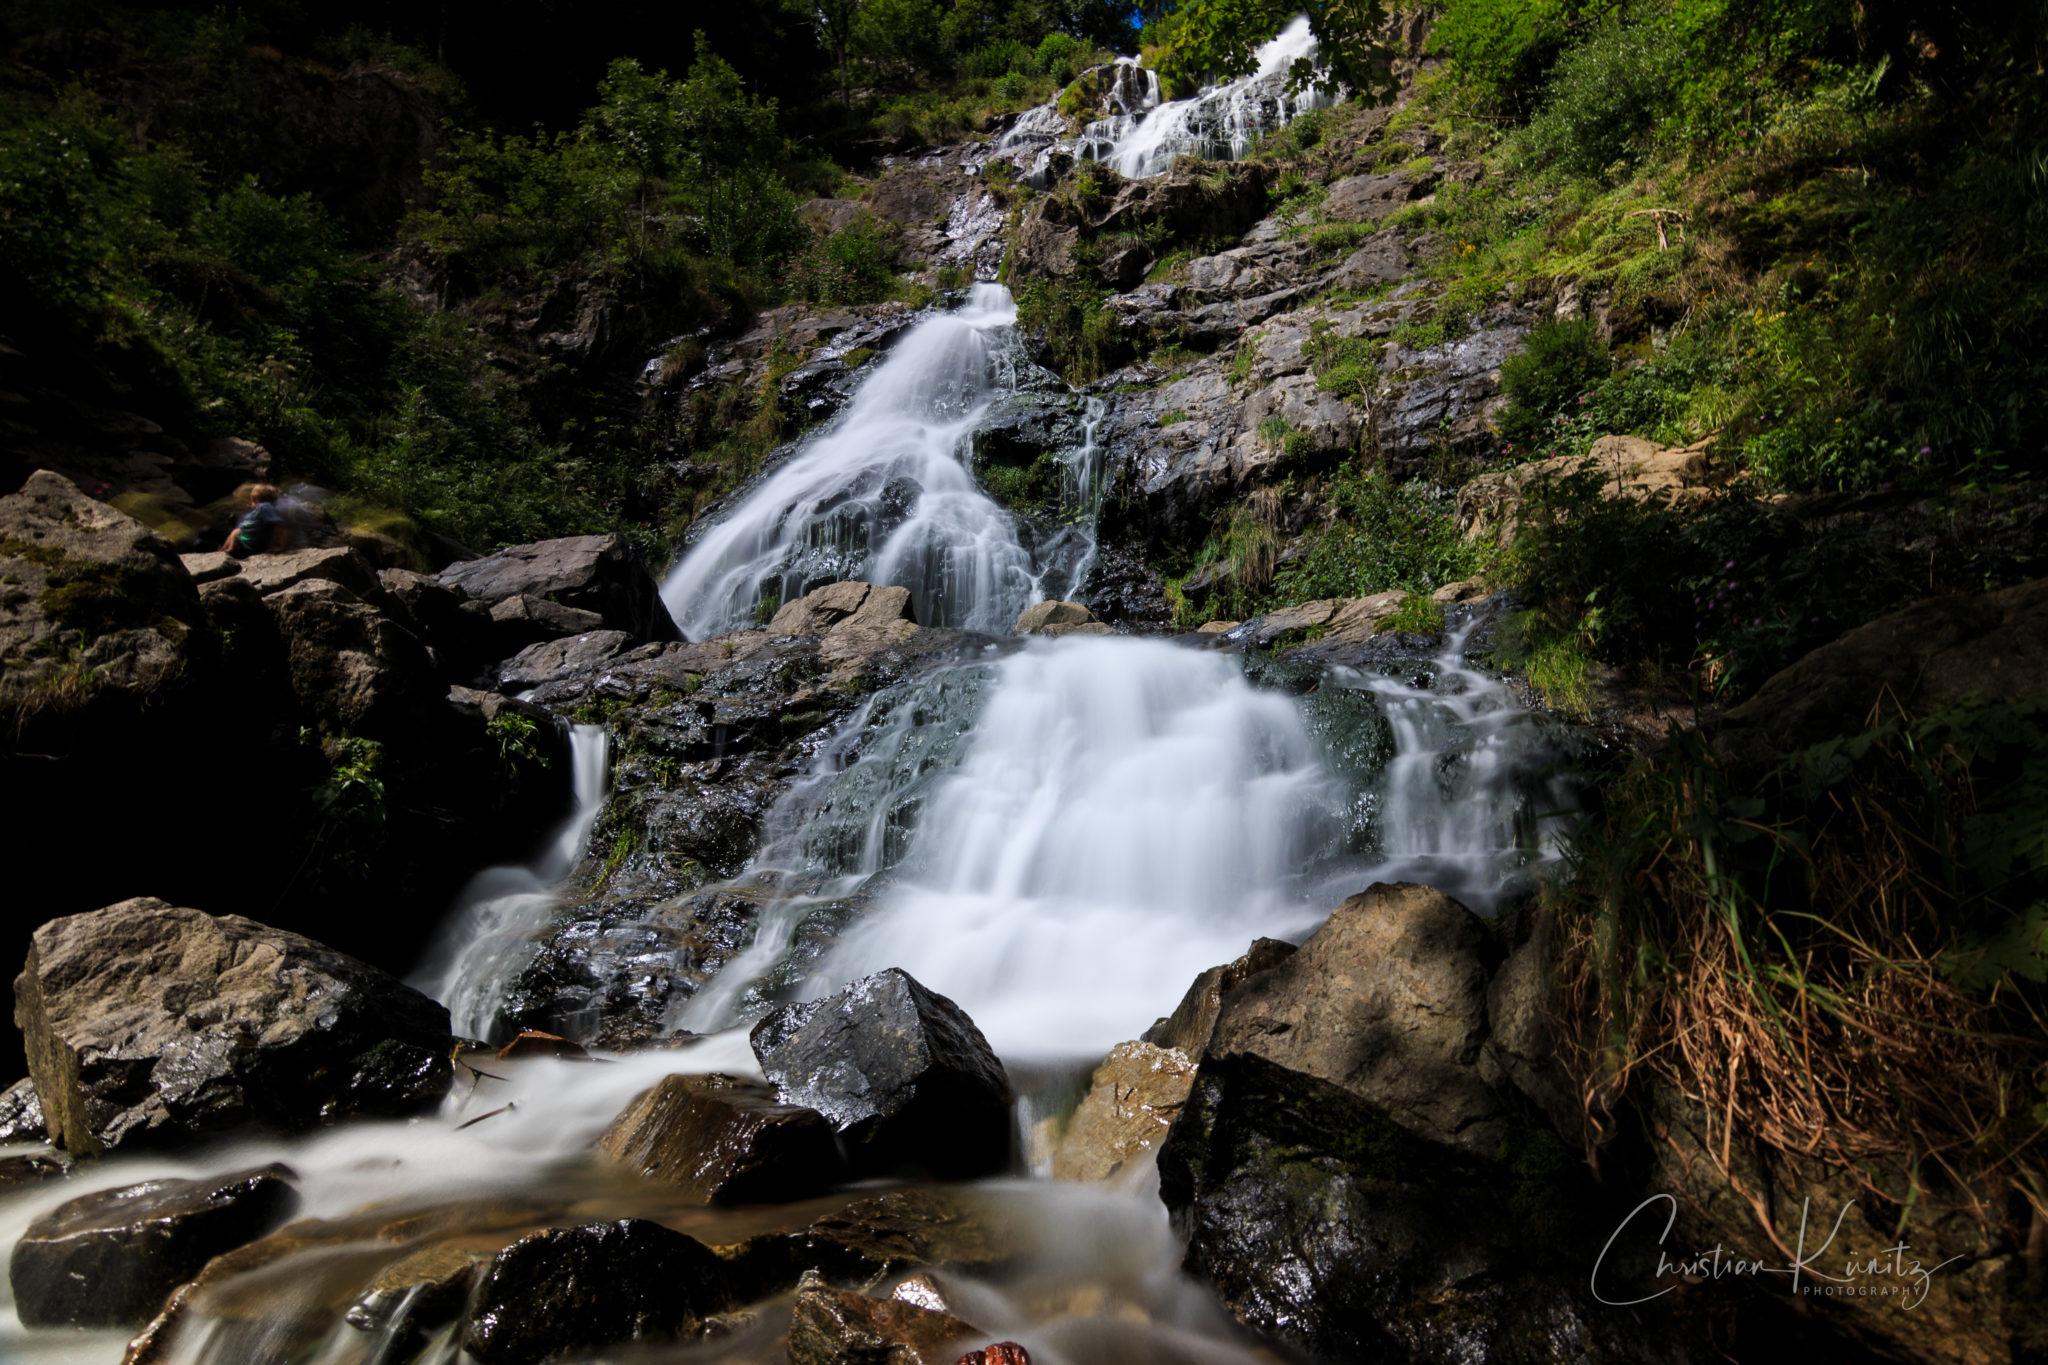 Todtnauer Wasserfall IV